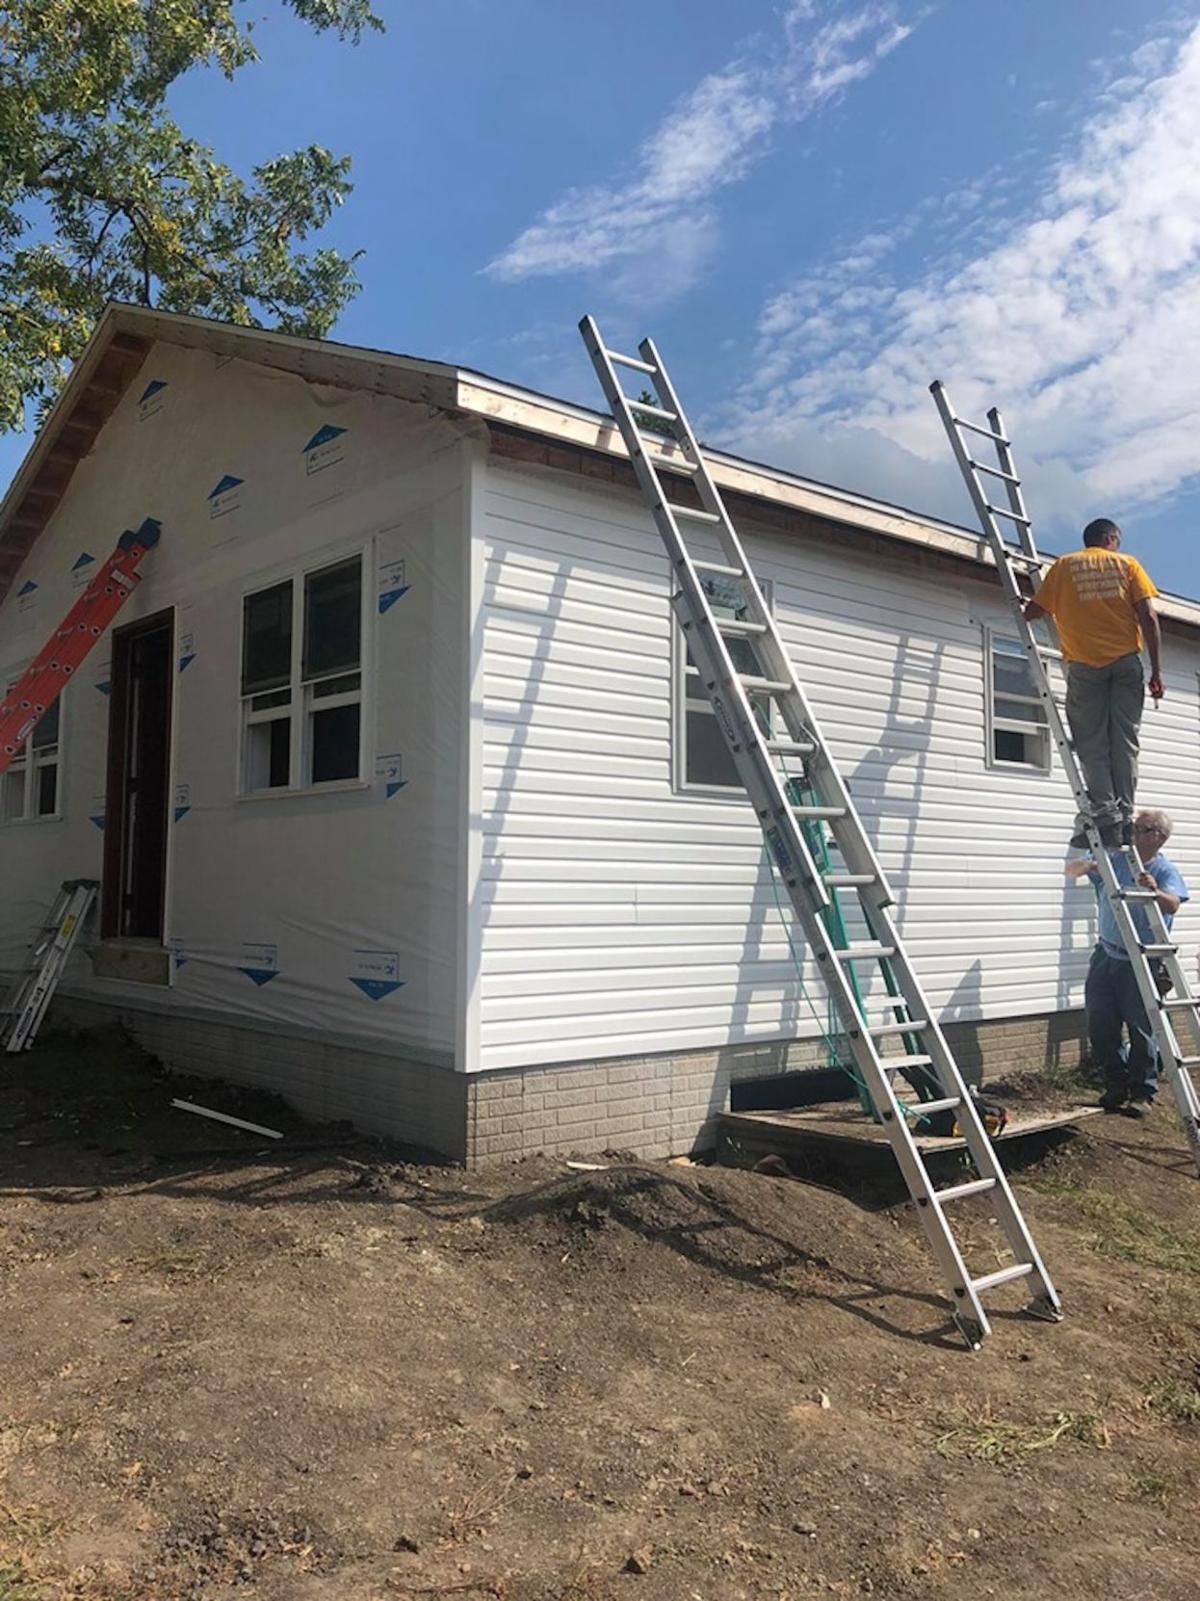 Habitat for Humanity volunteers work